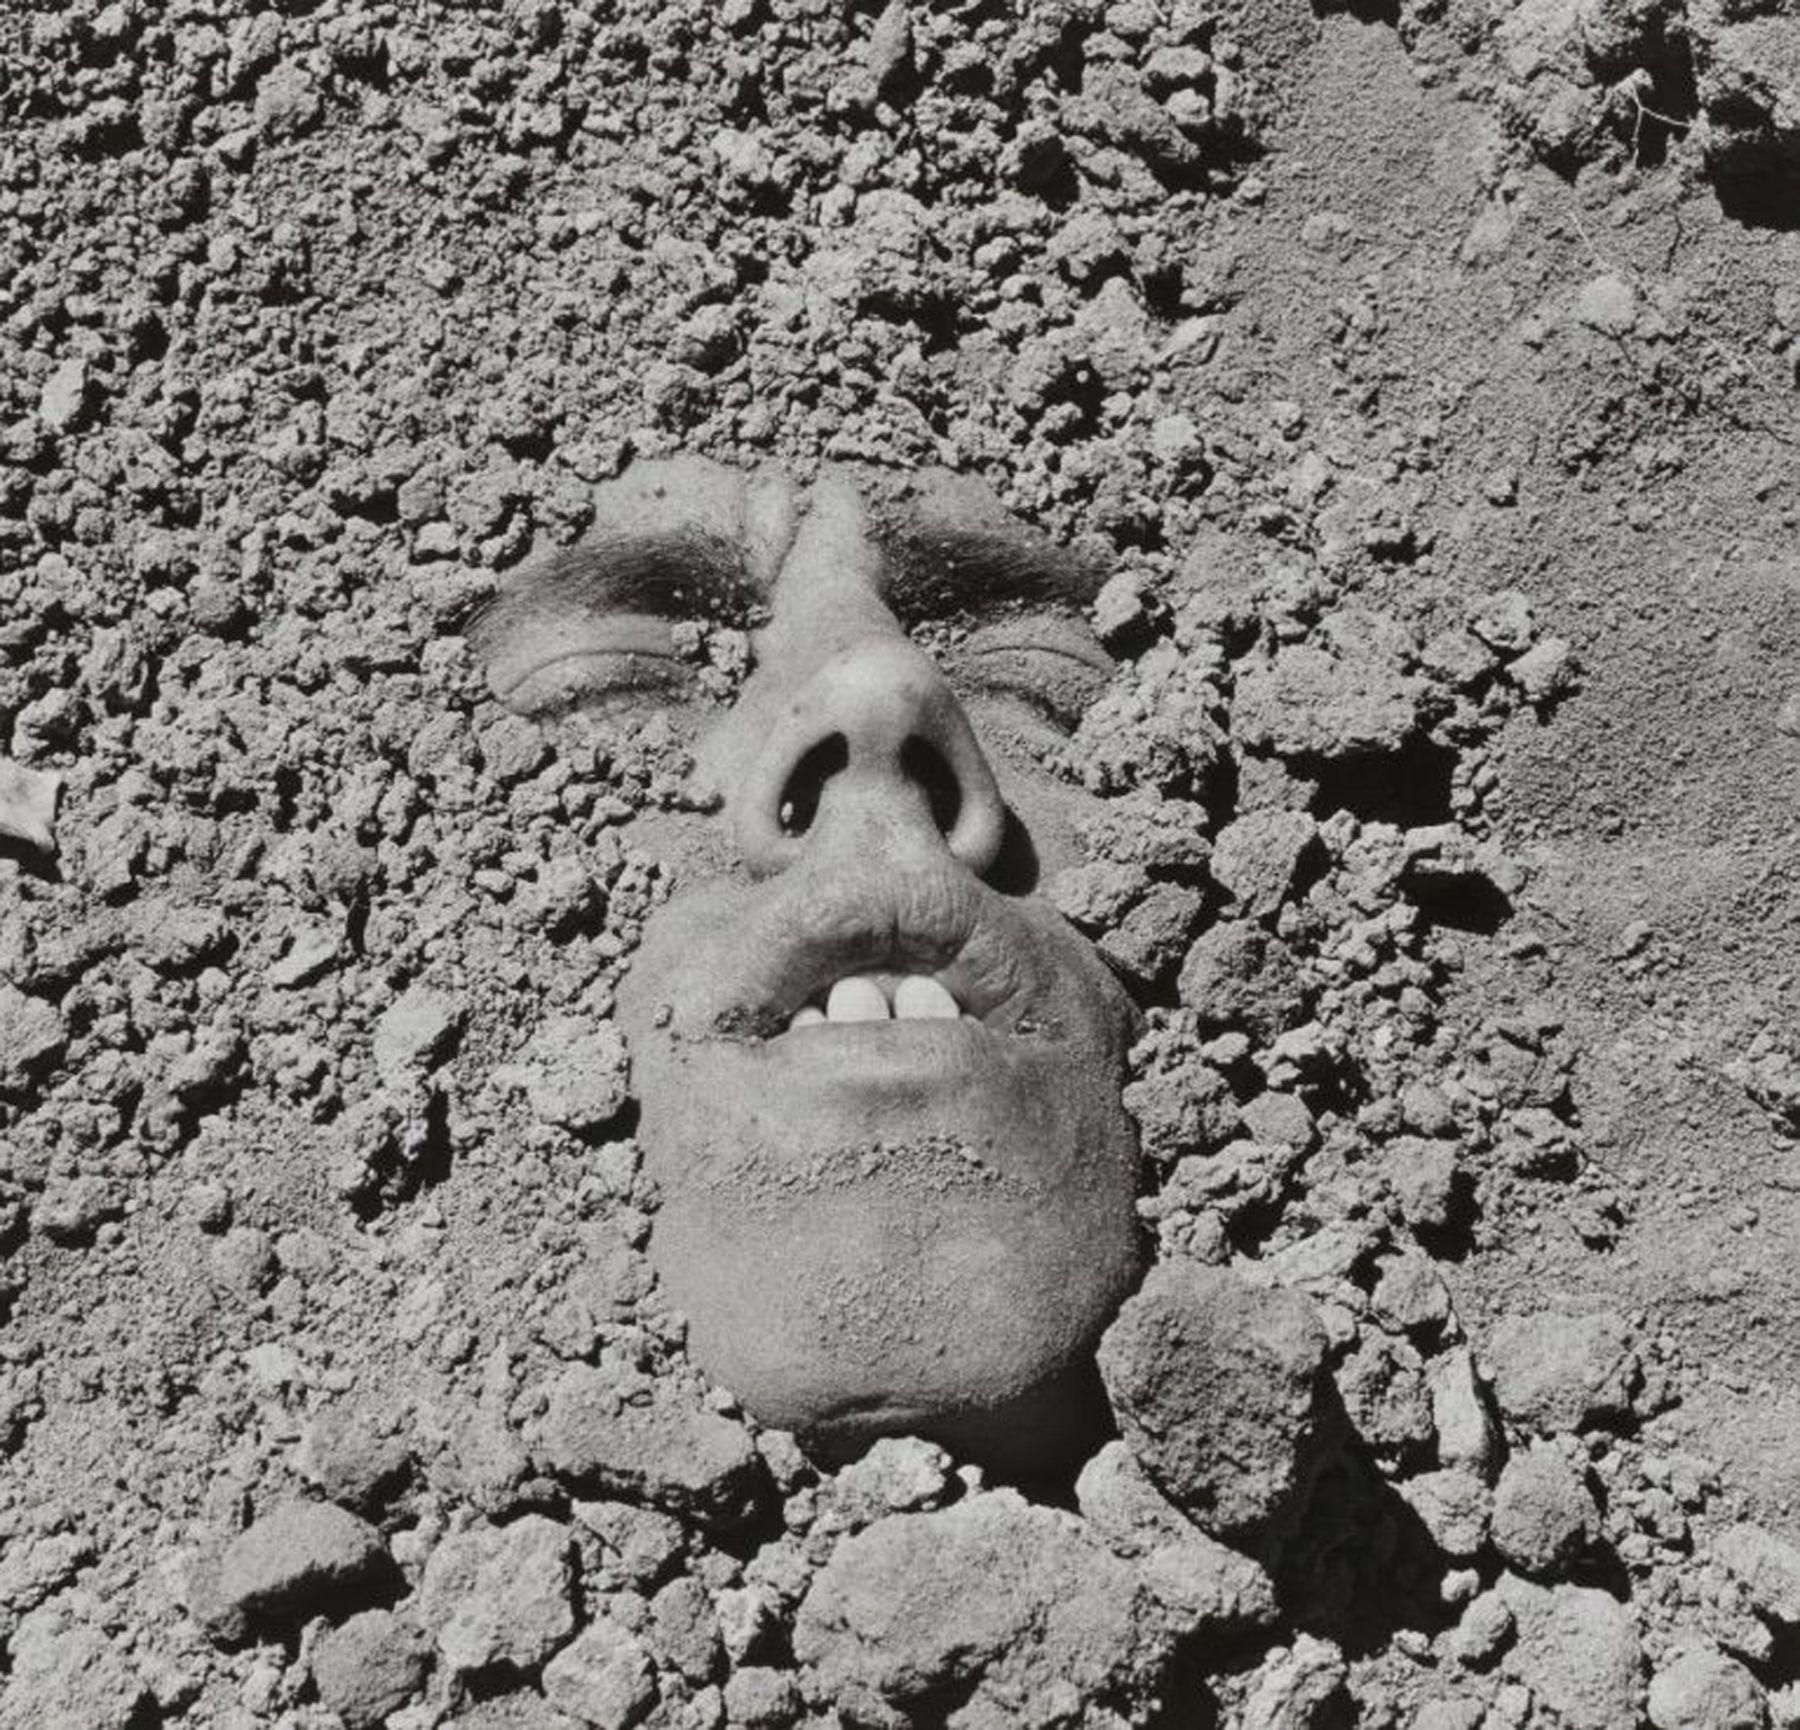 David Wojnarowicz, Untitled (Face in Dirt)